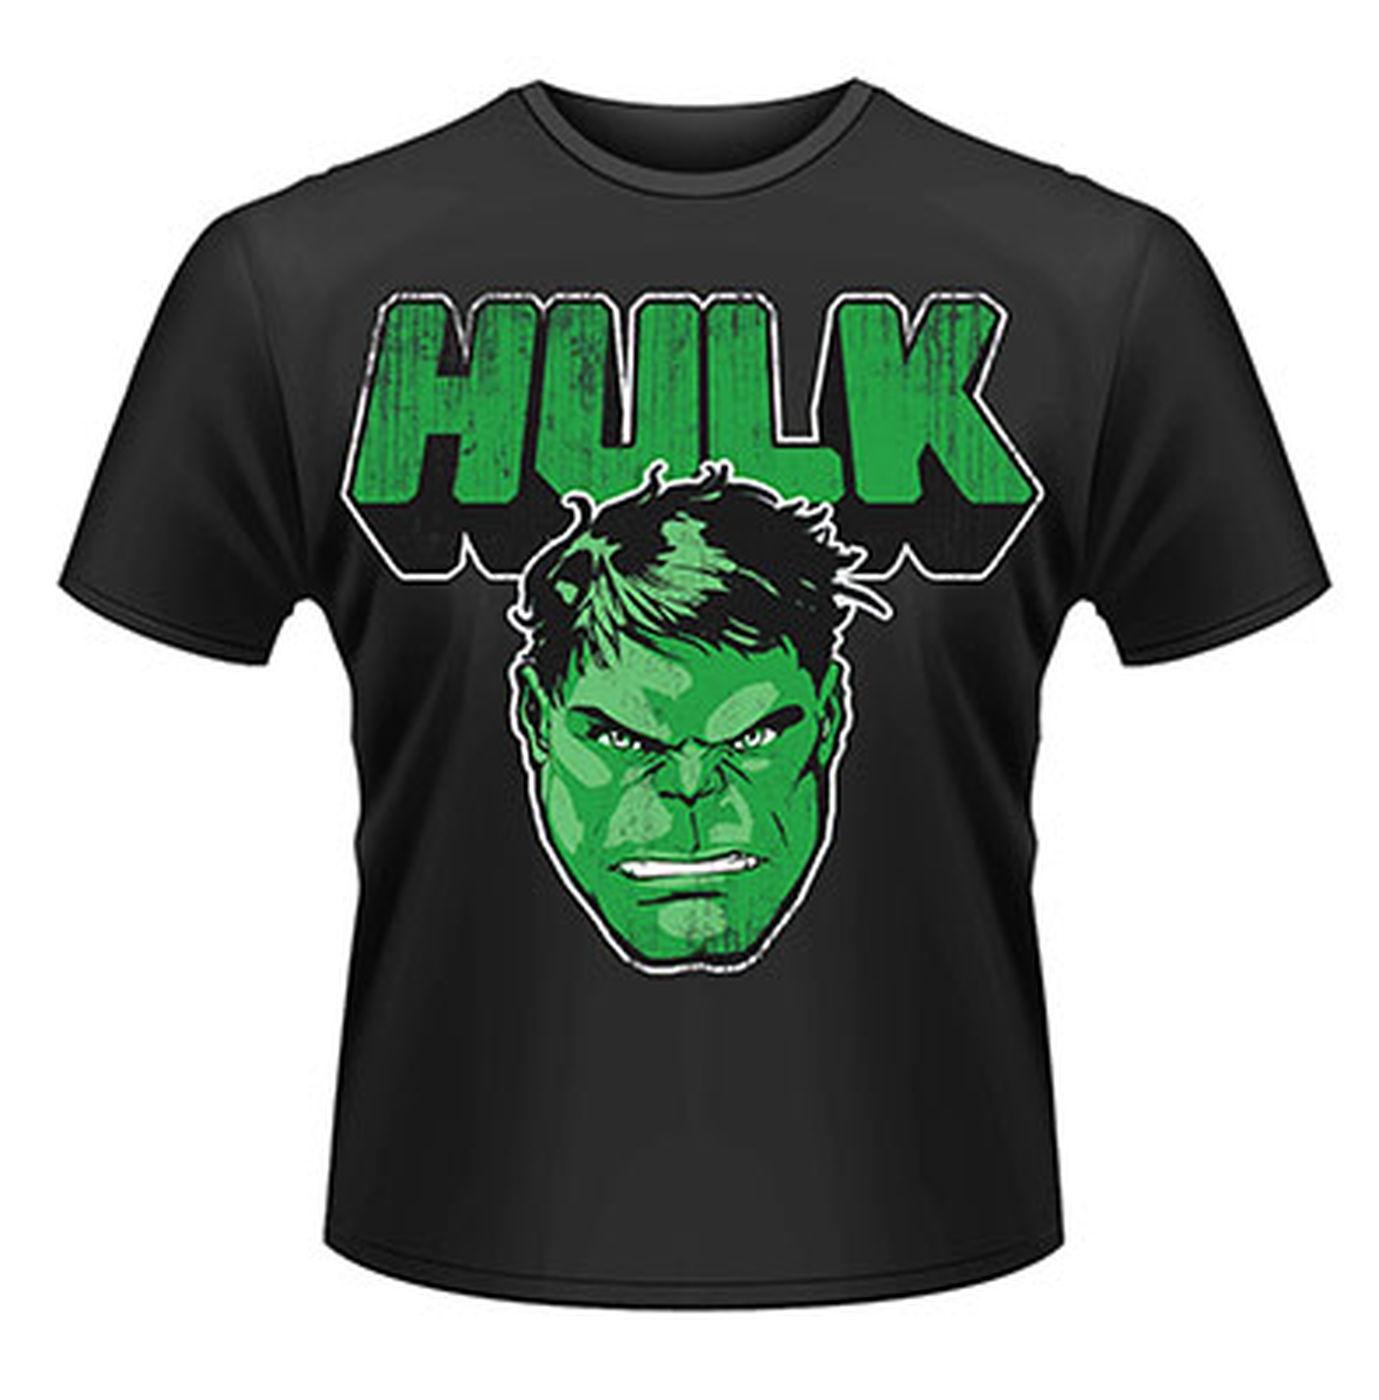 Marvel Avengers Assemble Hulk Avengers Assemble  Mens T-shirt